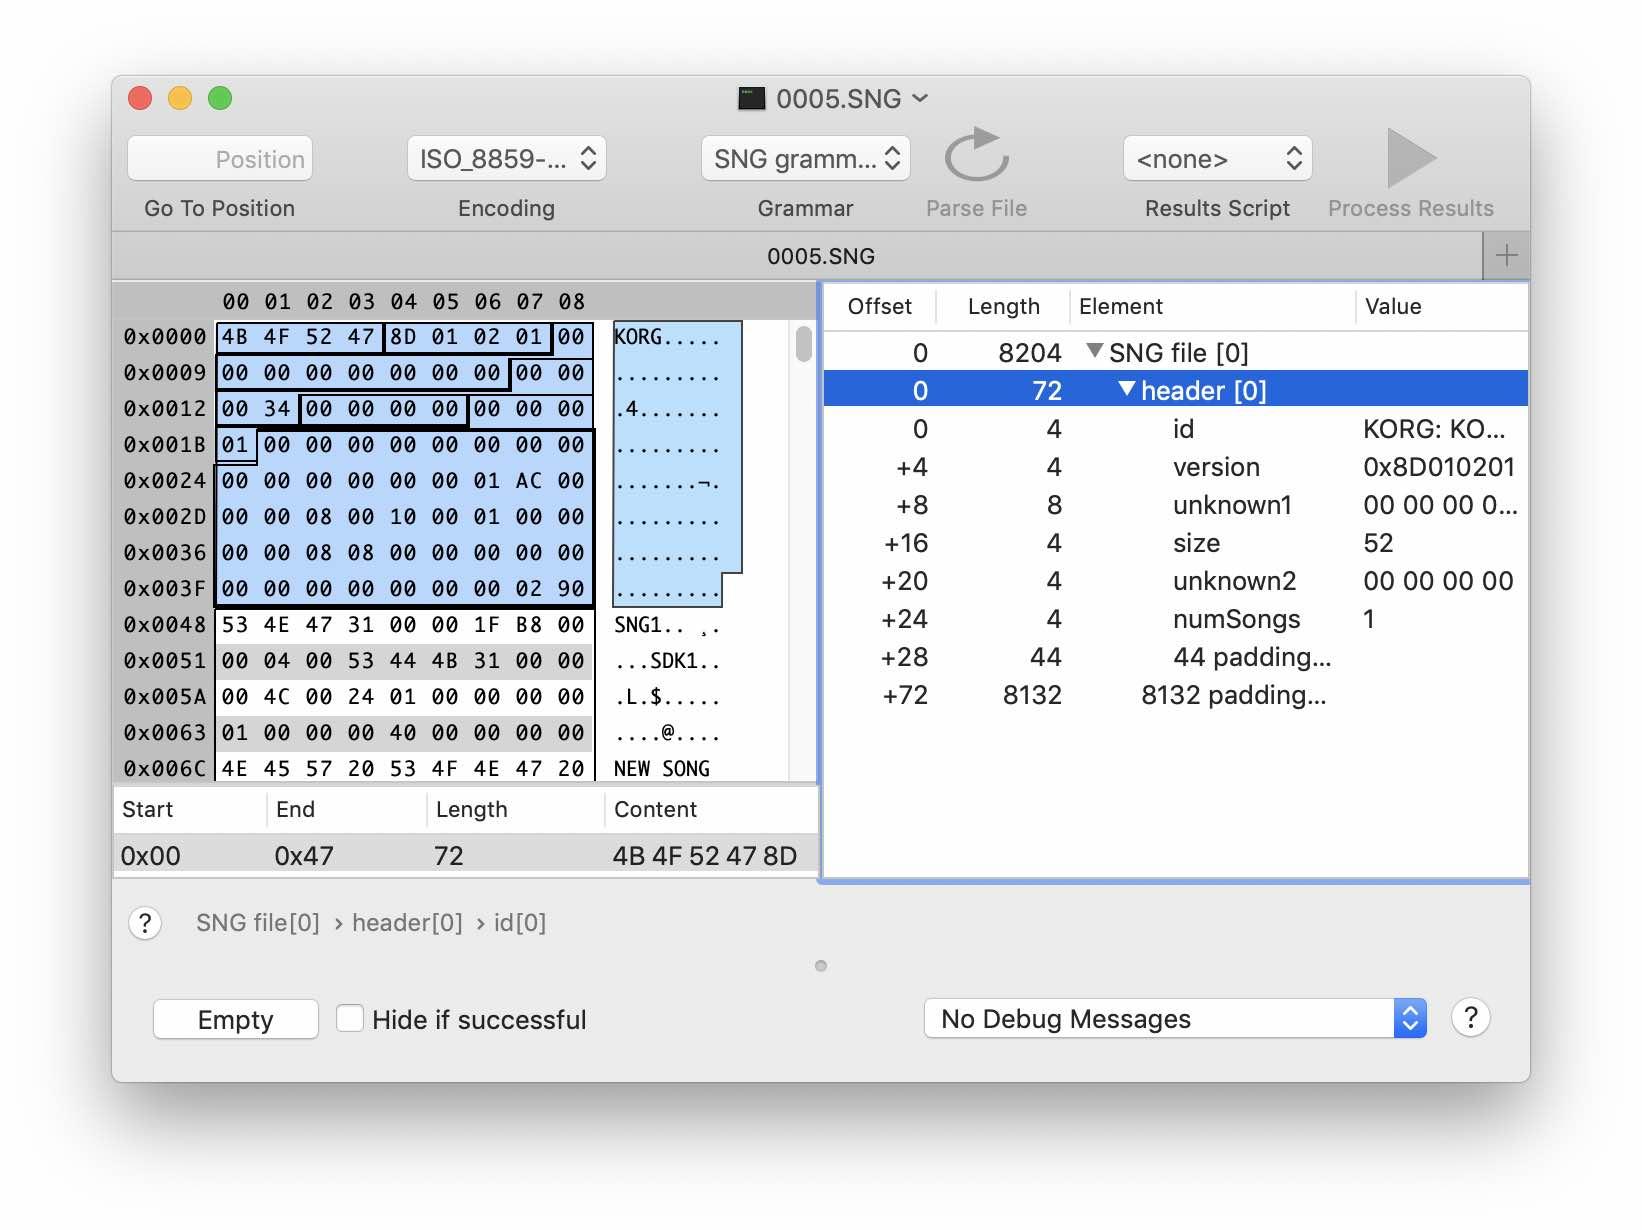 Реверс-инжиниринг бинарного формата на примере файлов Korg .SNG - 6